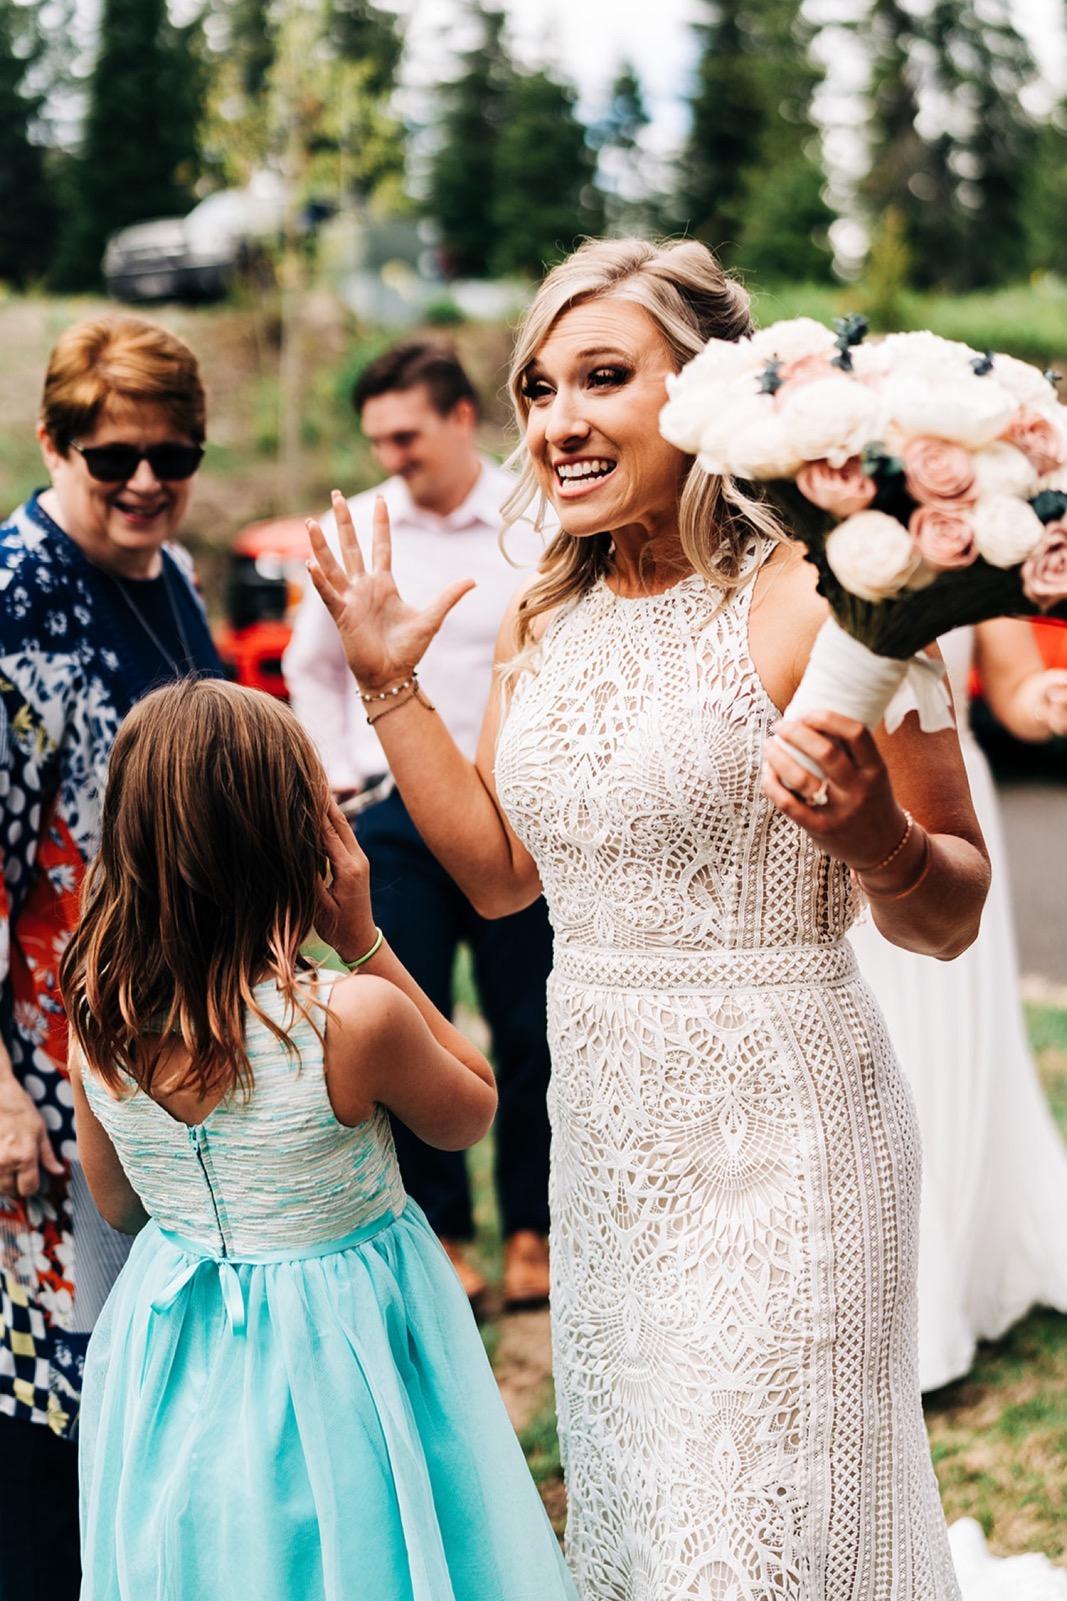 097_falissa_heather_wedding-243.jpg